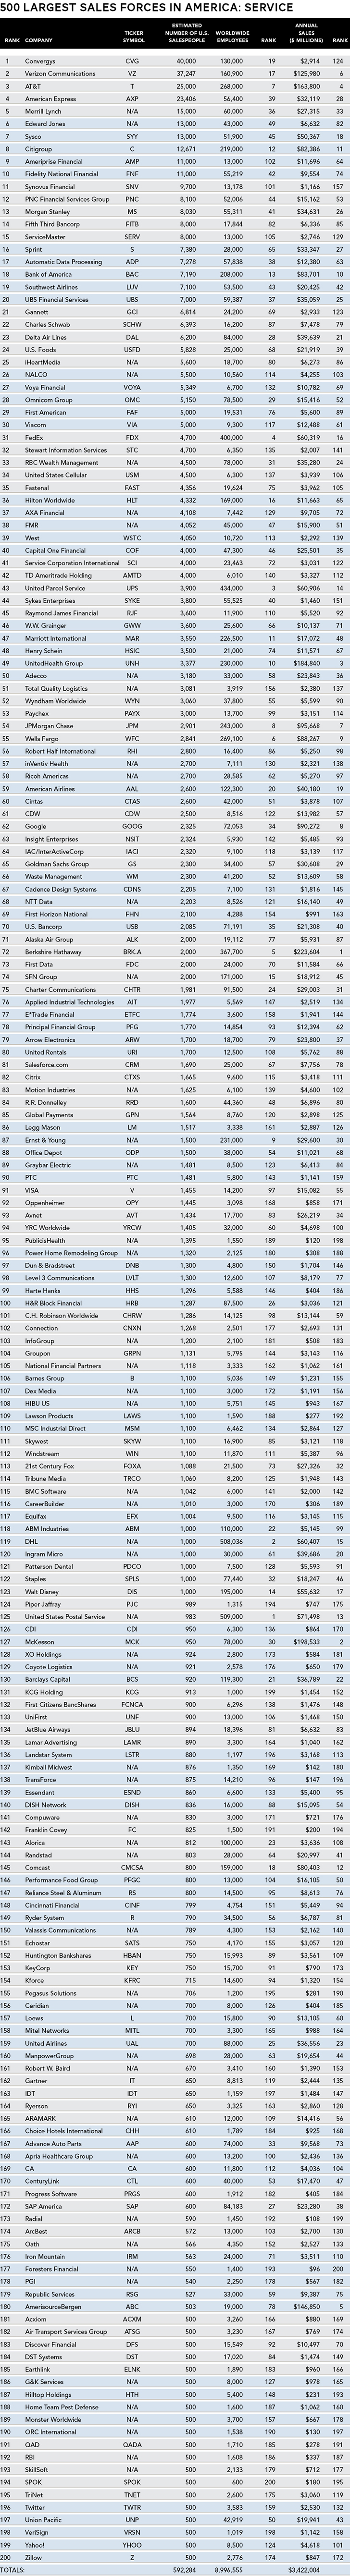 Top Service Companies